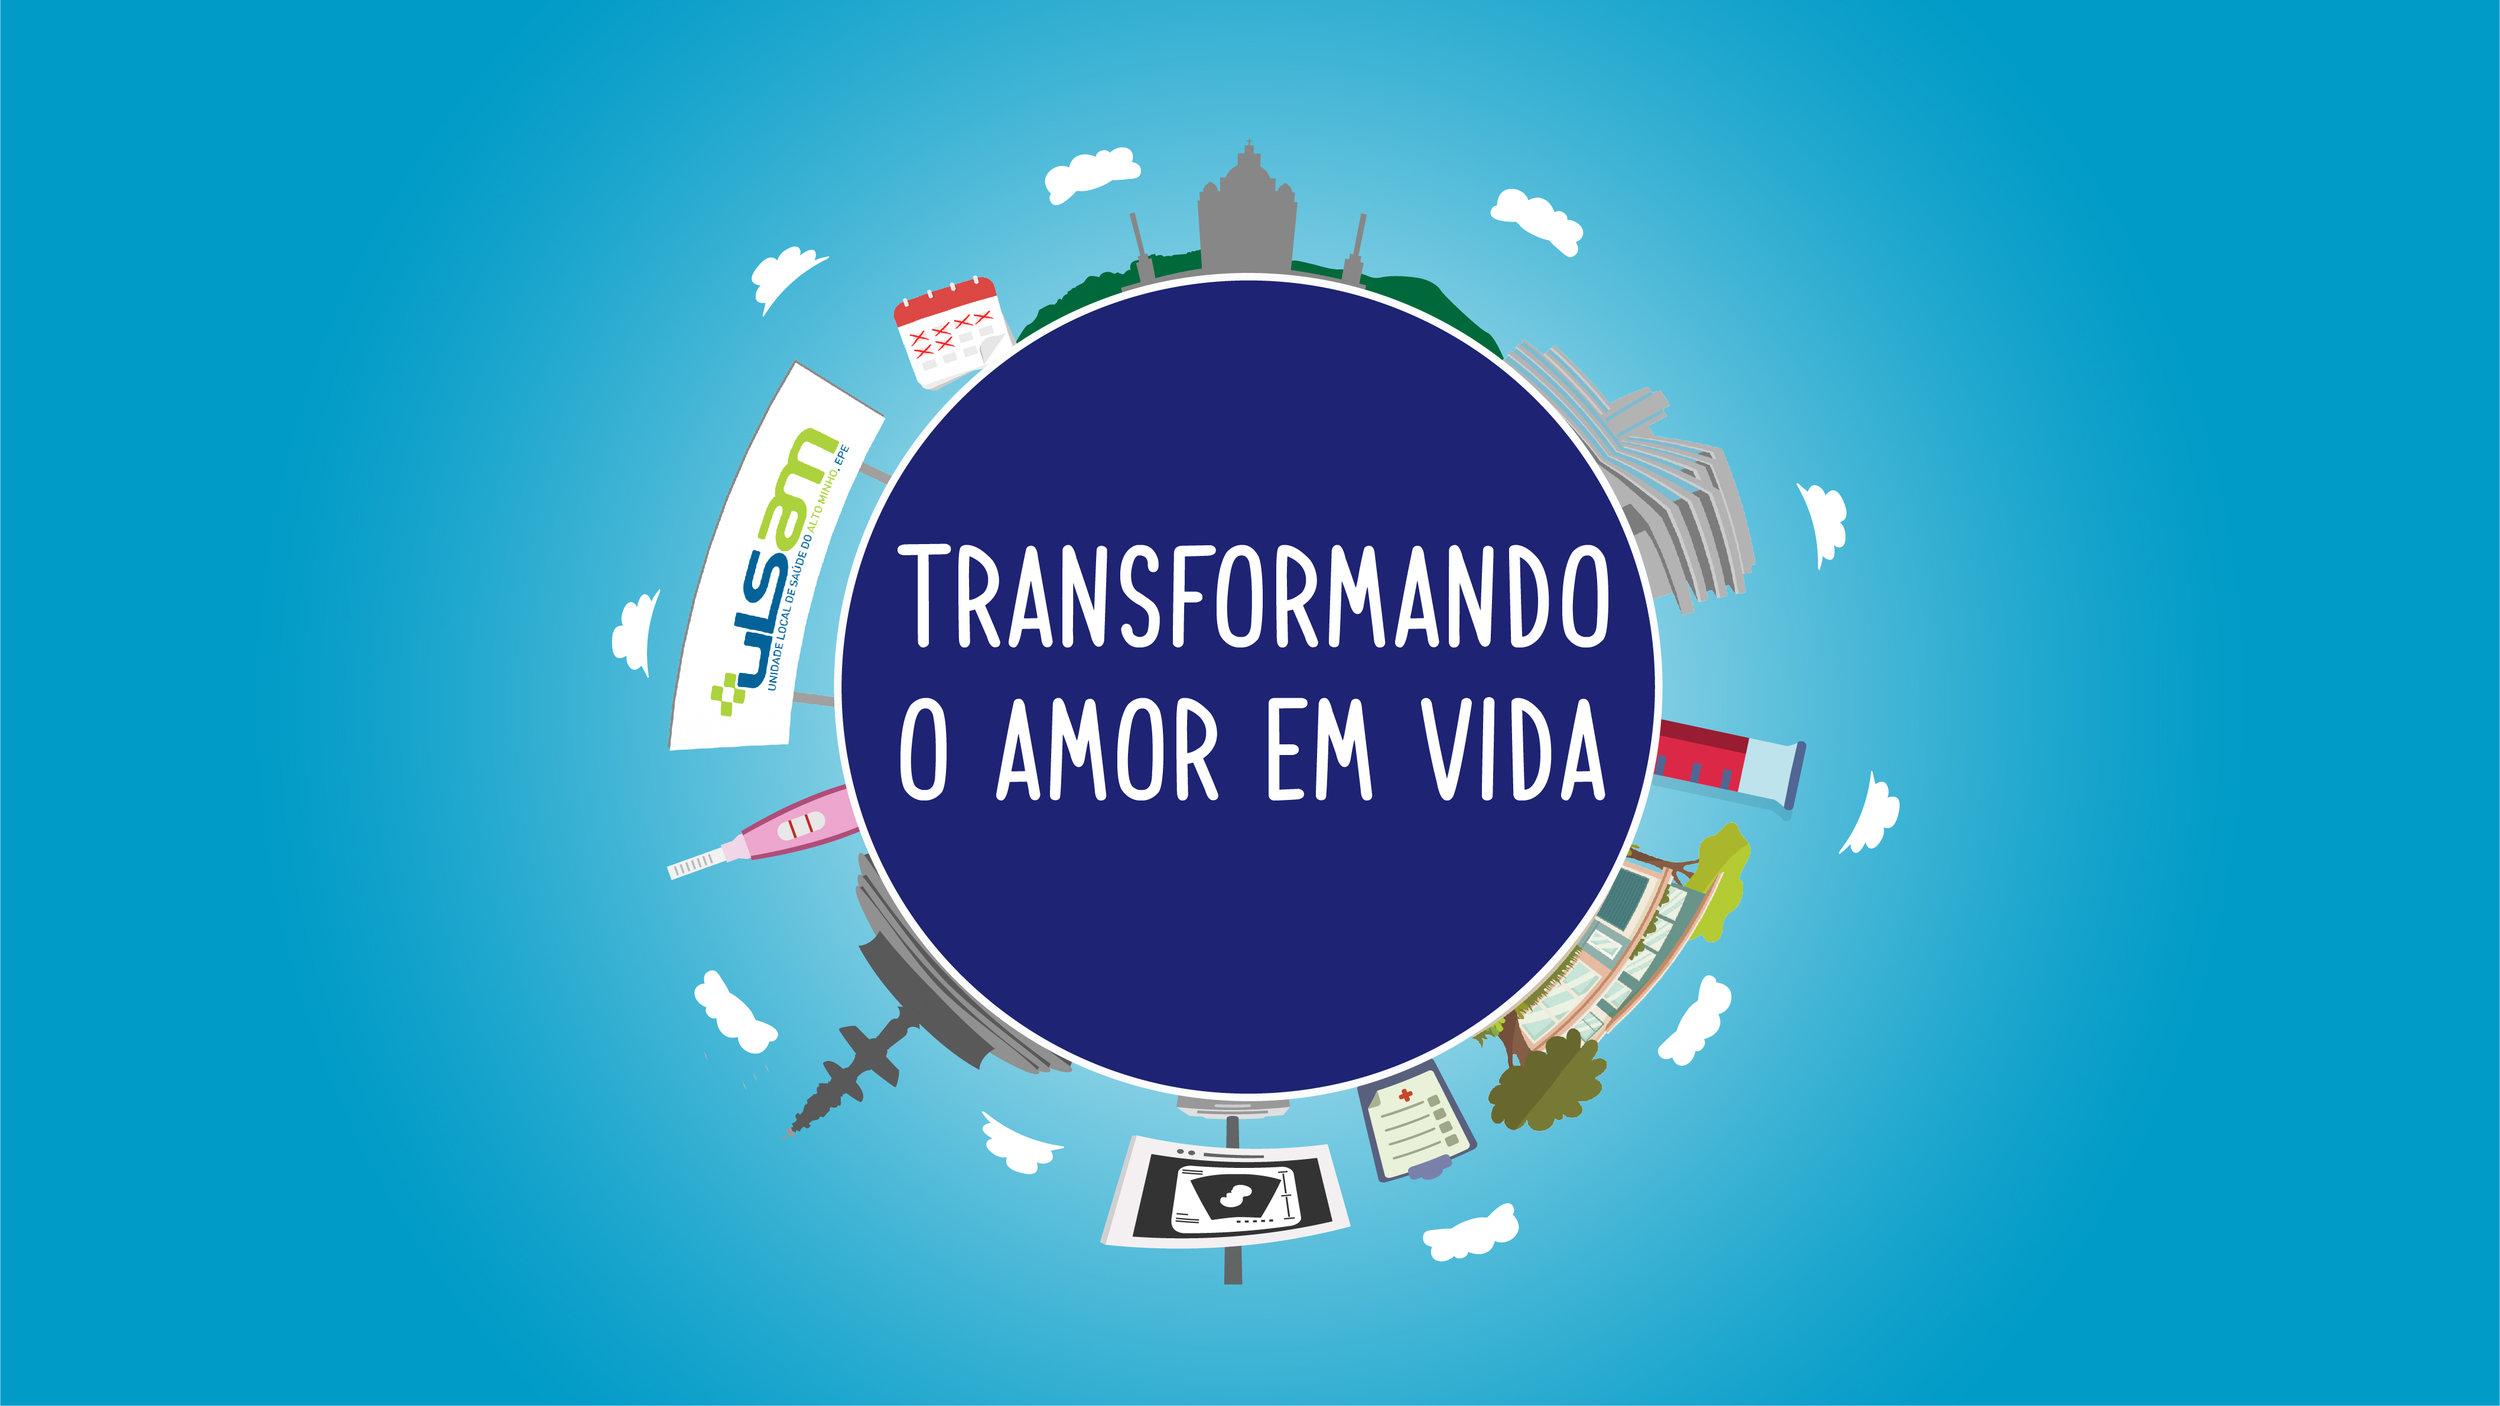 11_Thumbnail_Transformando_amir_em_Vida.jpg